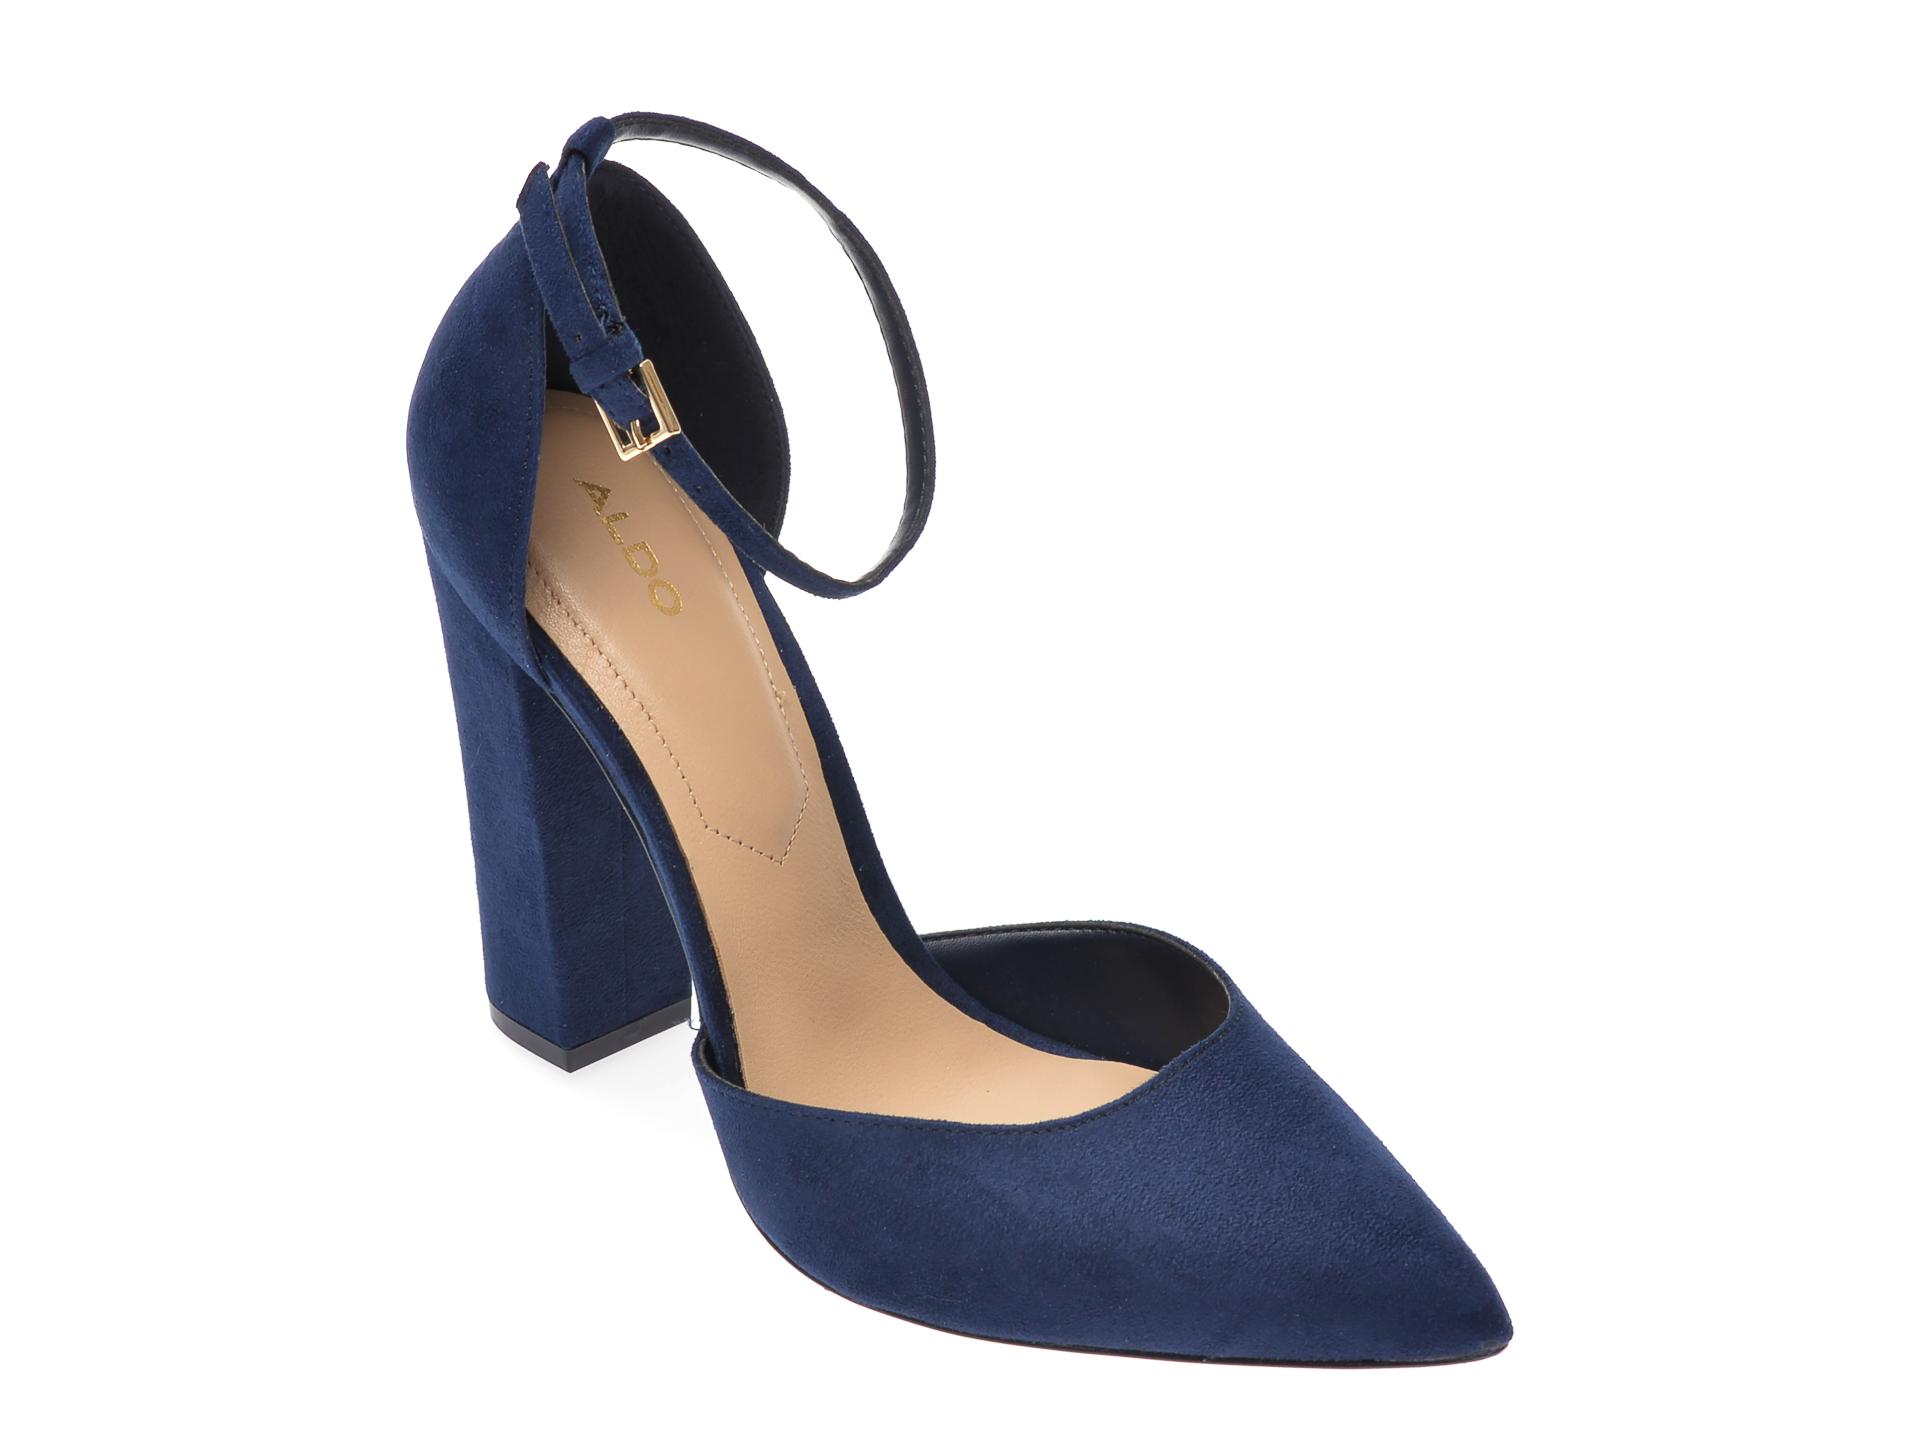 Pantofi ALDO bleumarin, Nicholes410, din piele ecologica imagine otter.ro 2021